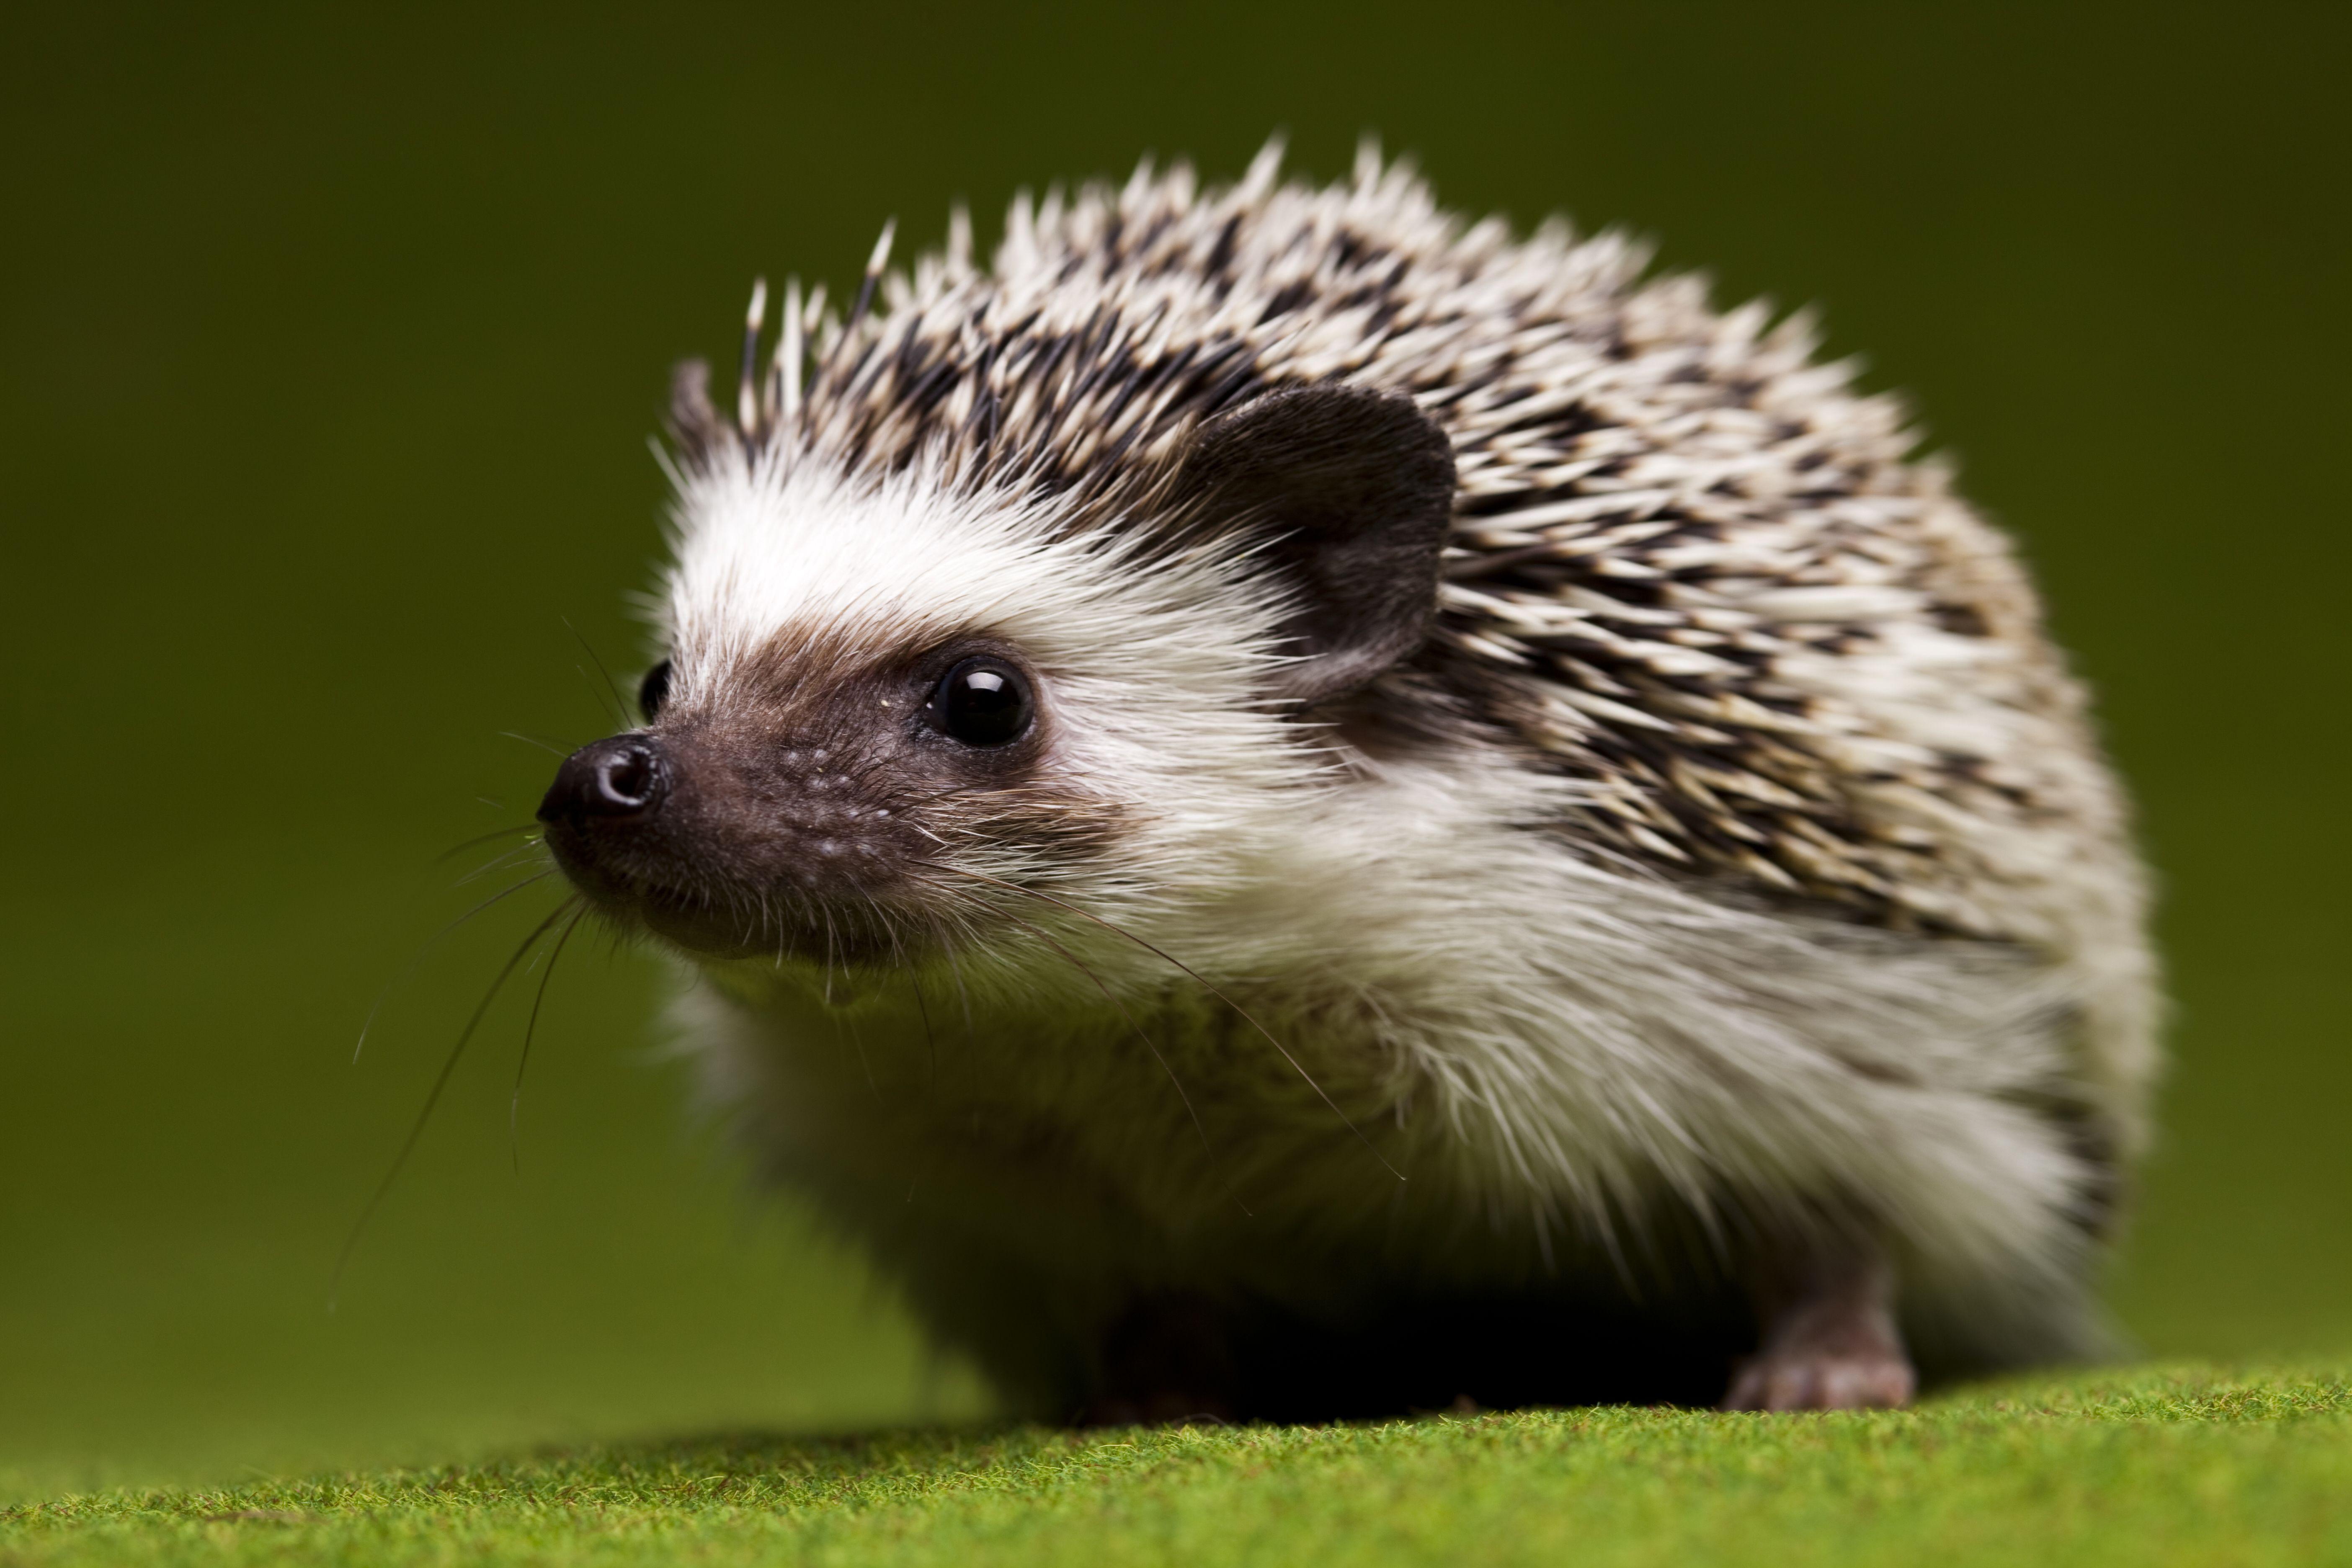 Little Cute Animal Hedgehog Animal Cool Pets Cute Animals